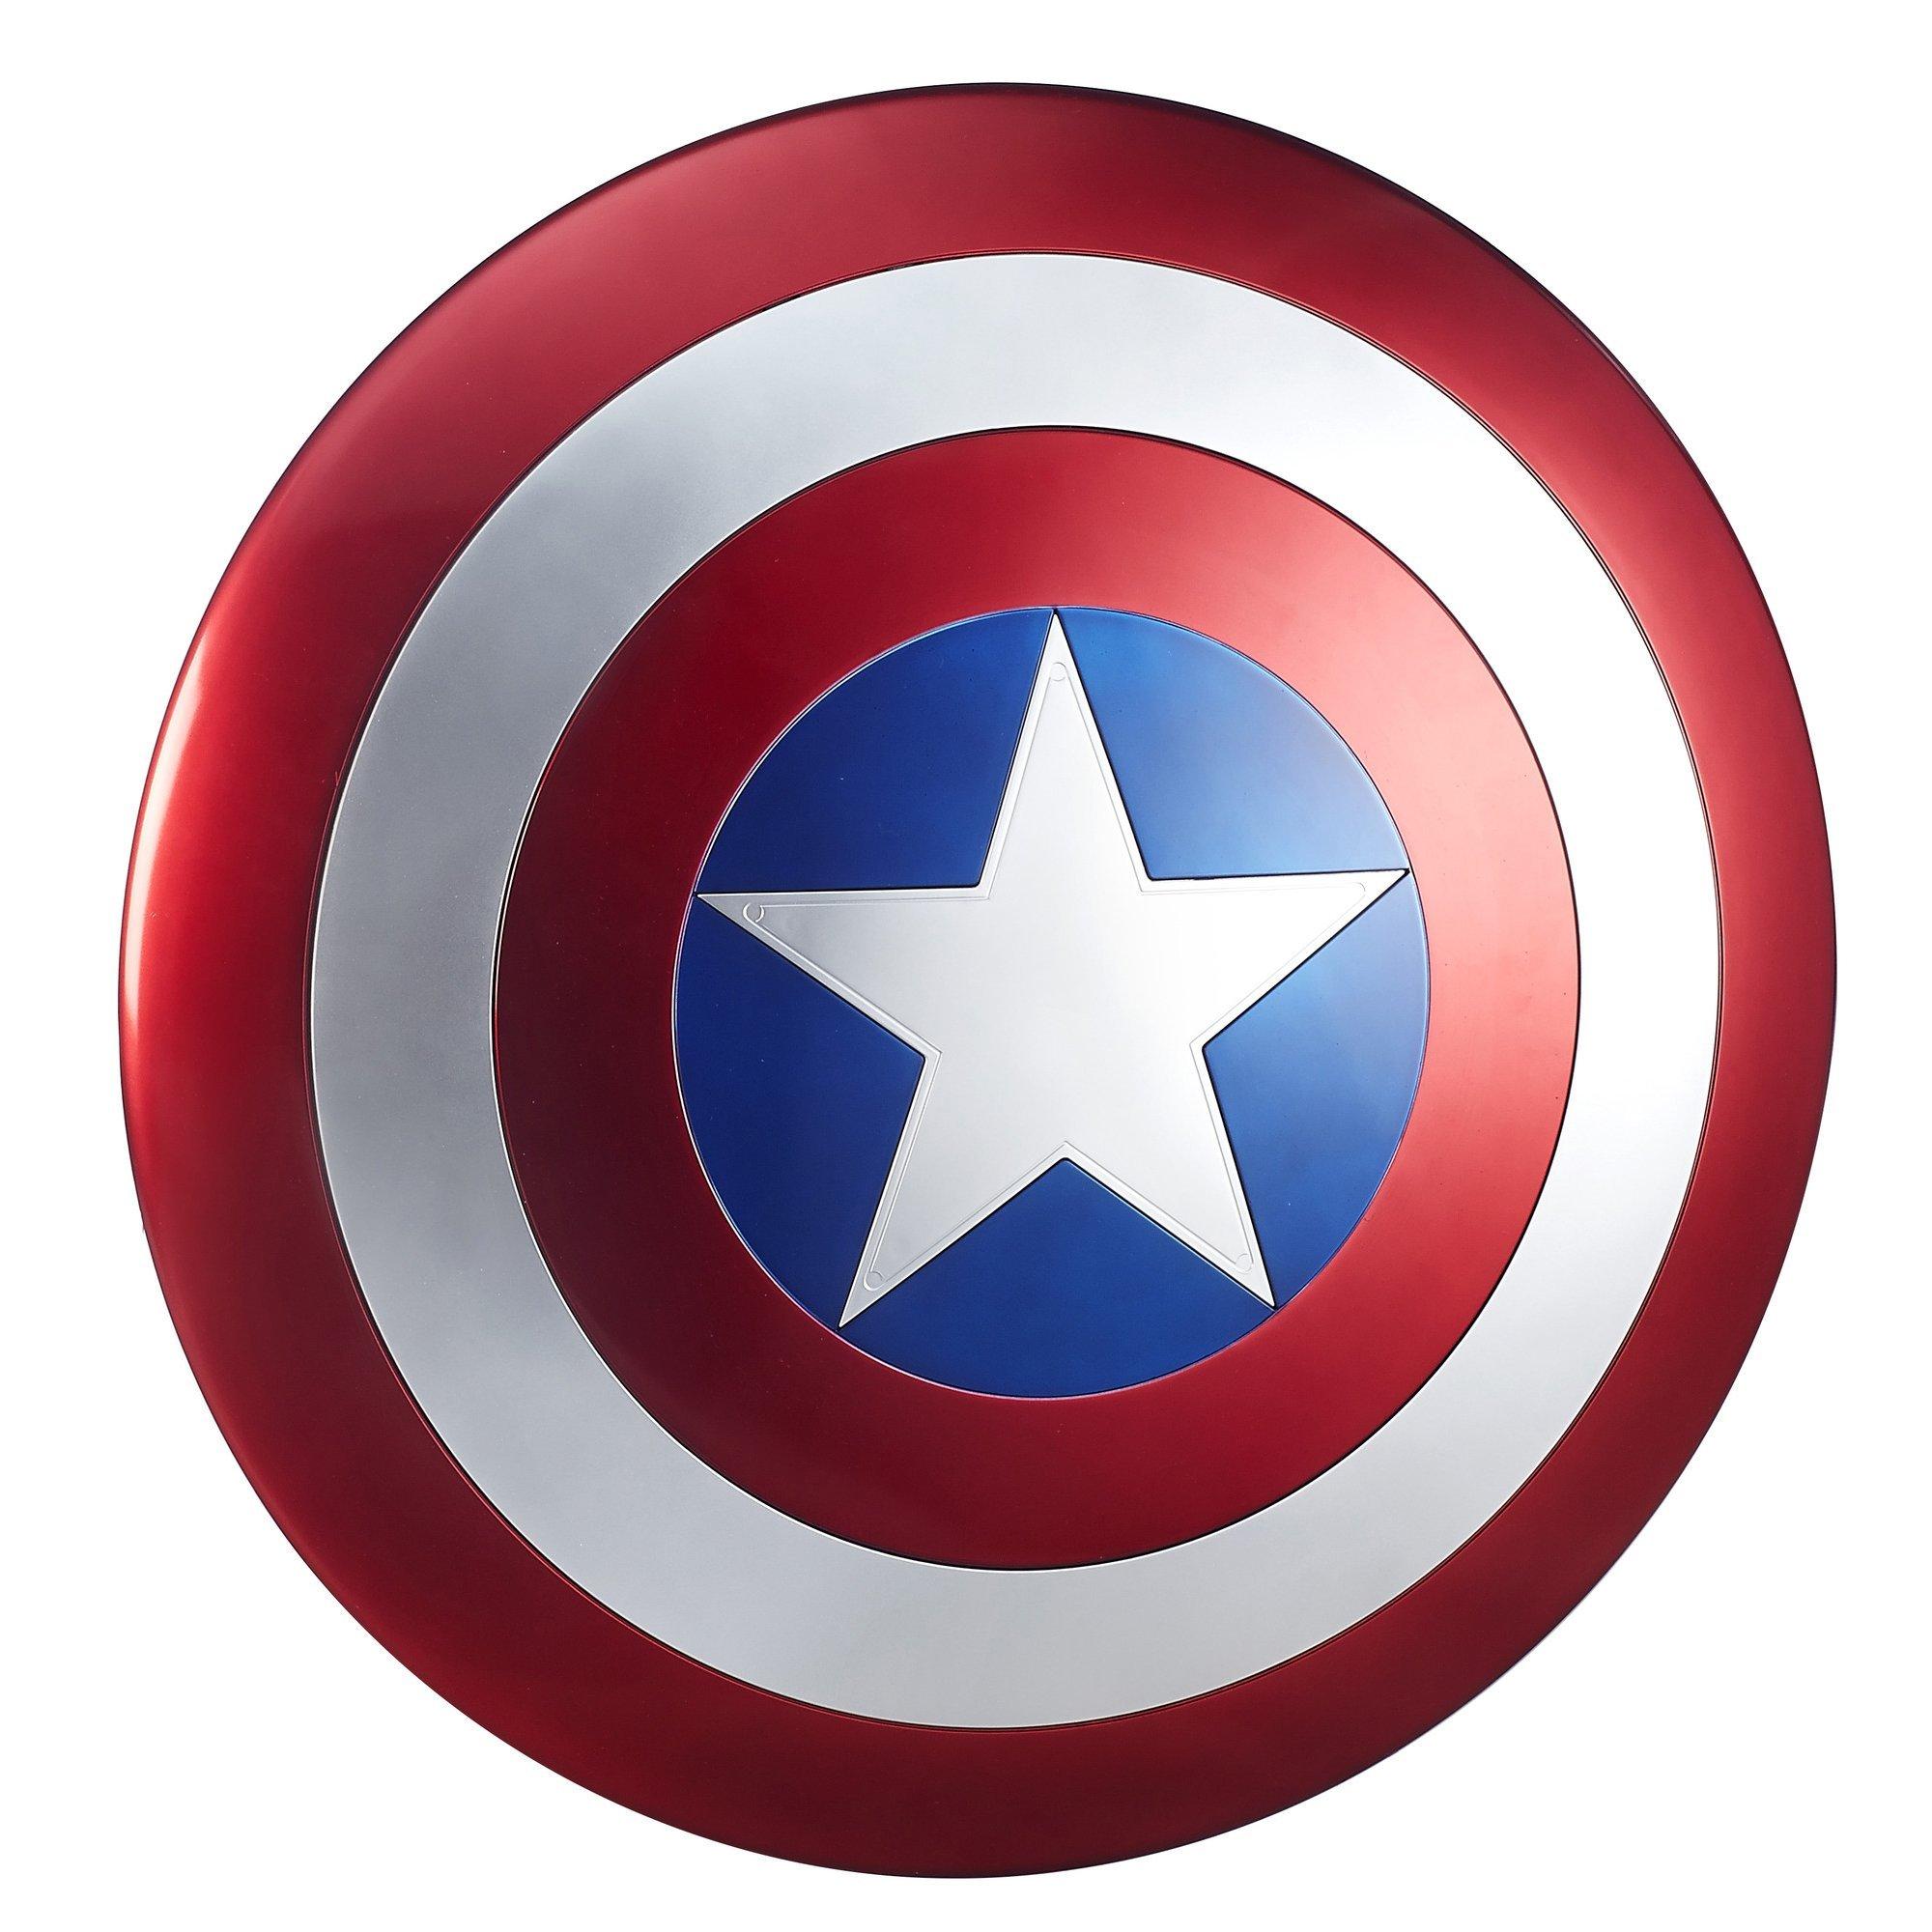 Marvel Legends Captain America Shield by Avengers (Image #3)